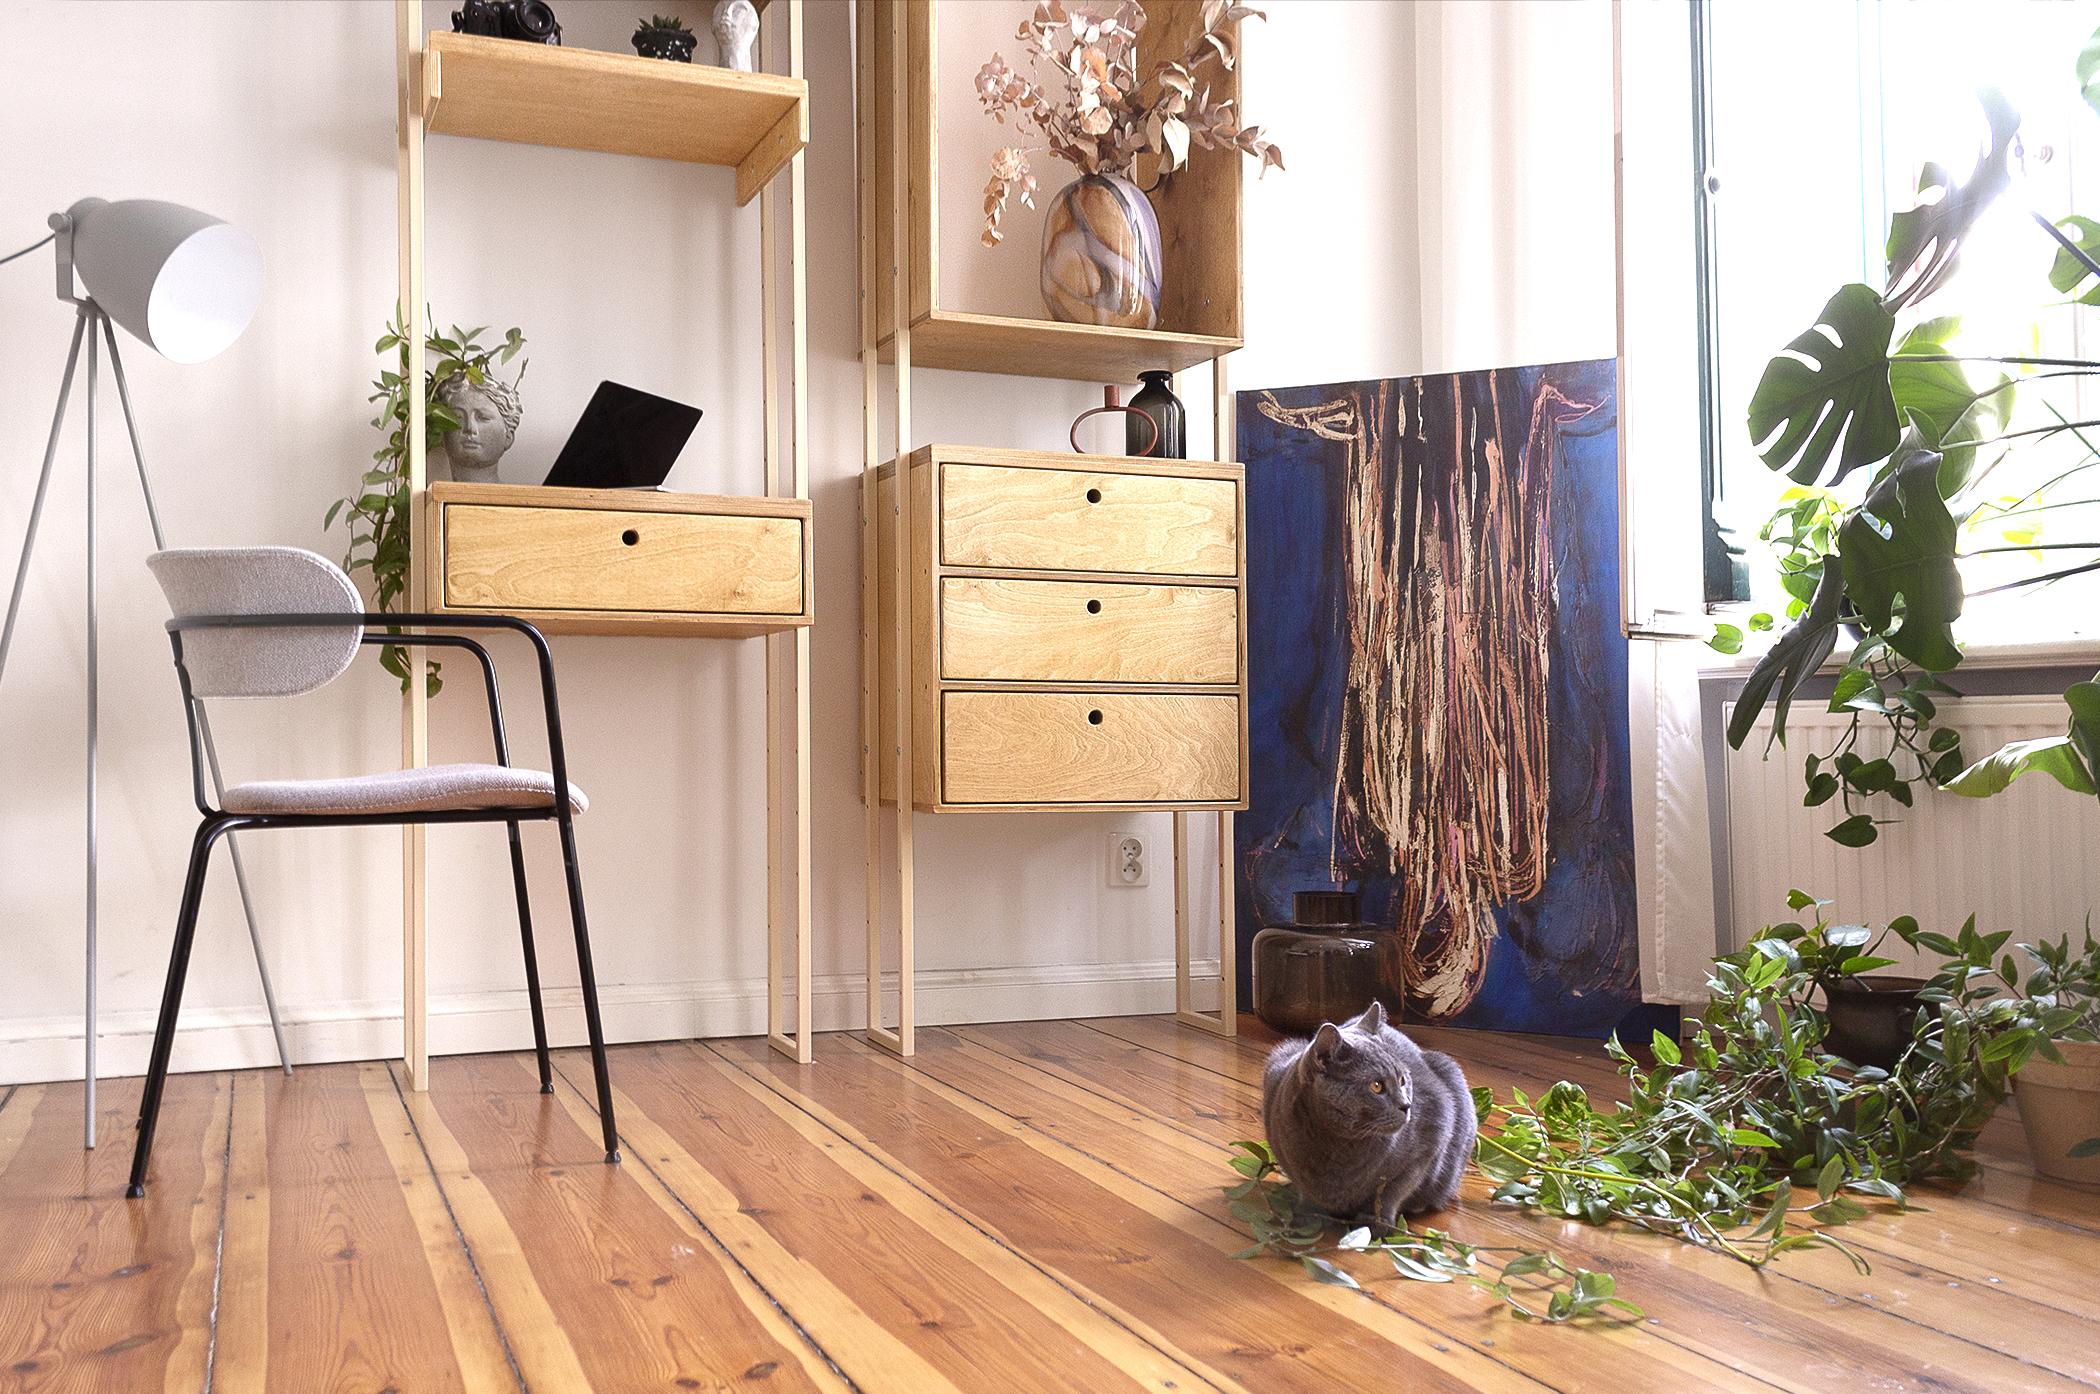 plywood steel modular system bookshelf wardrobe